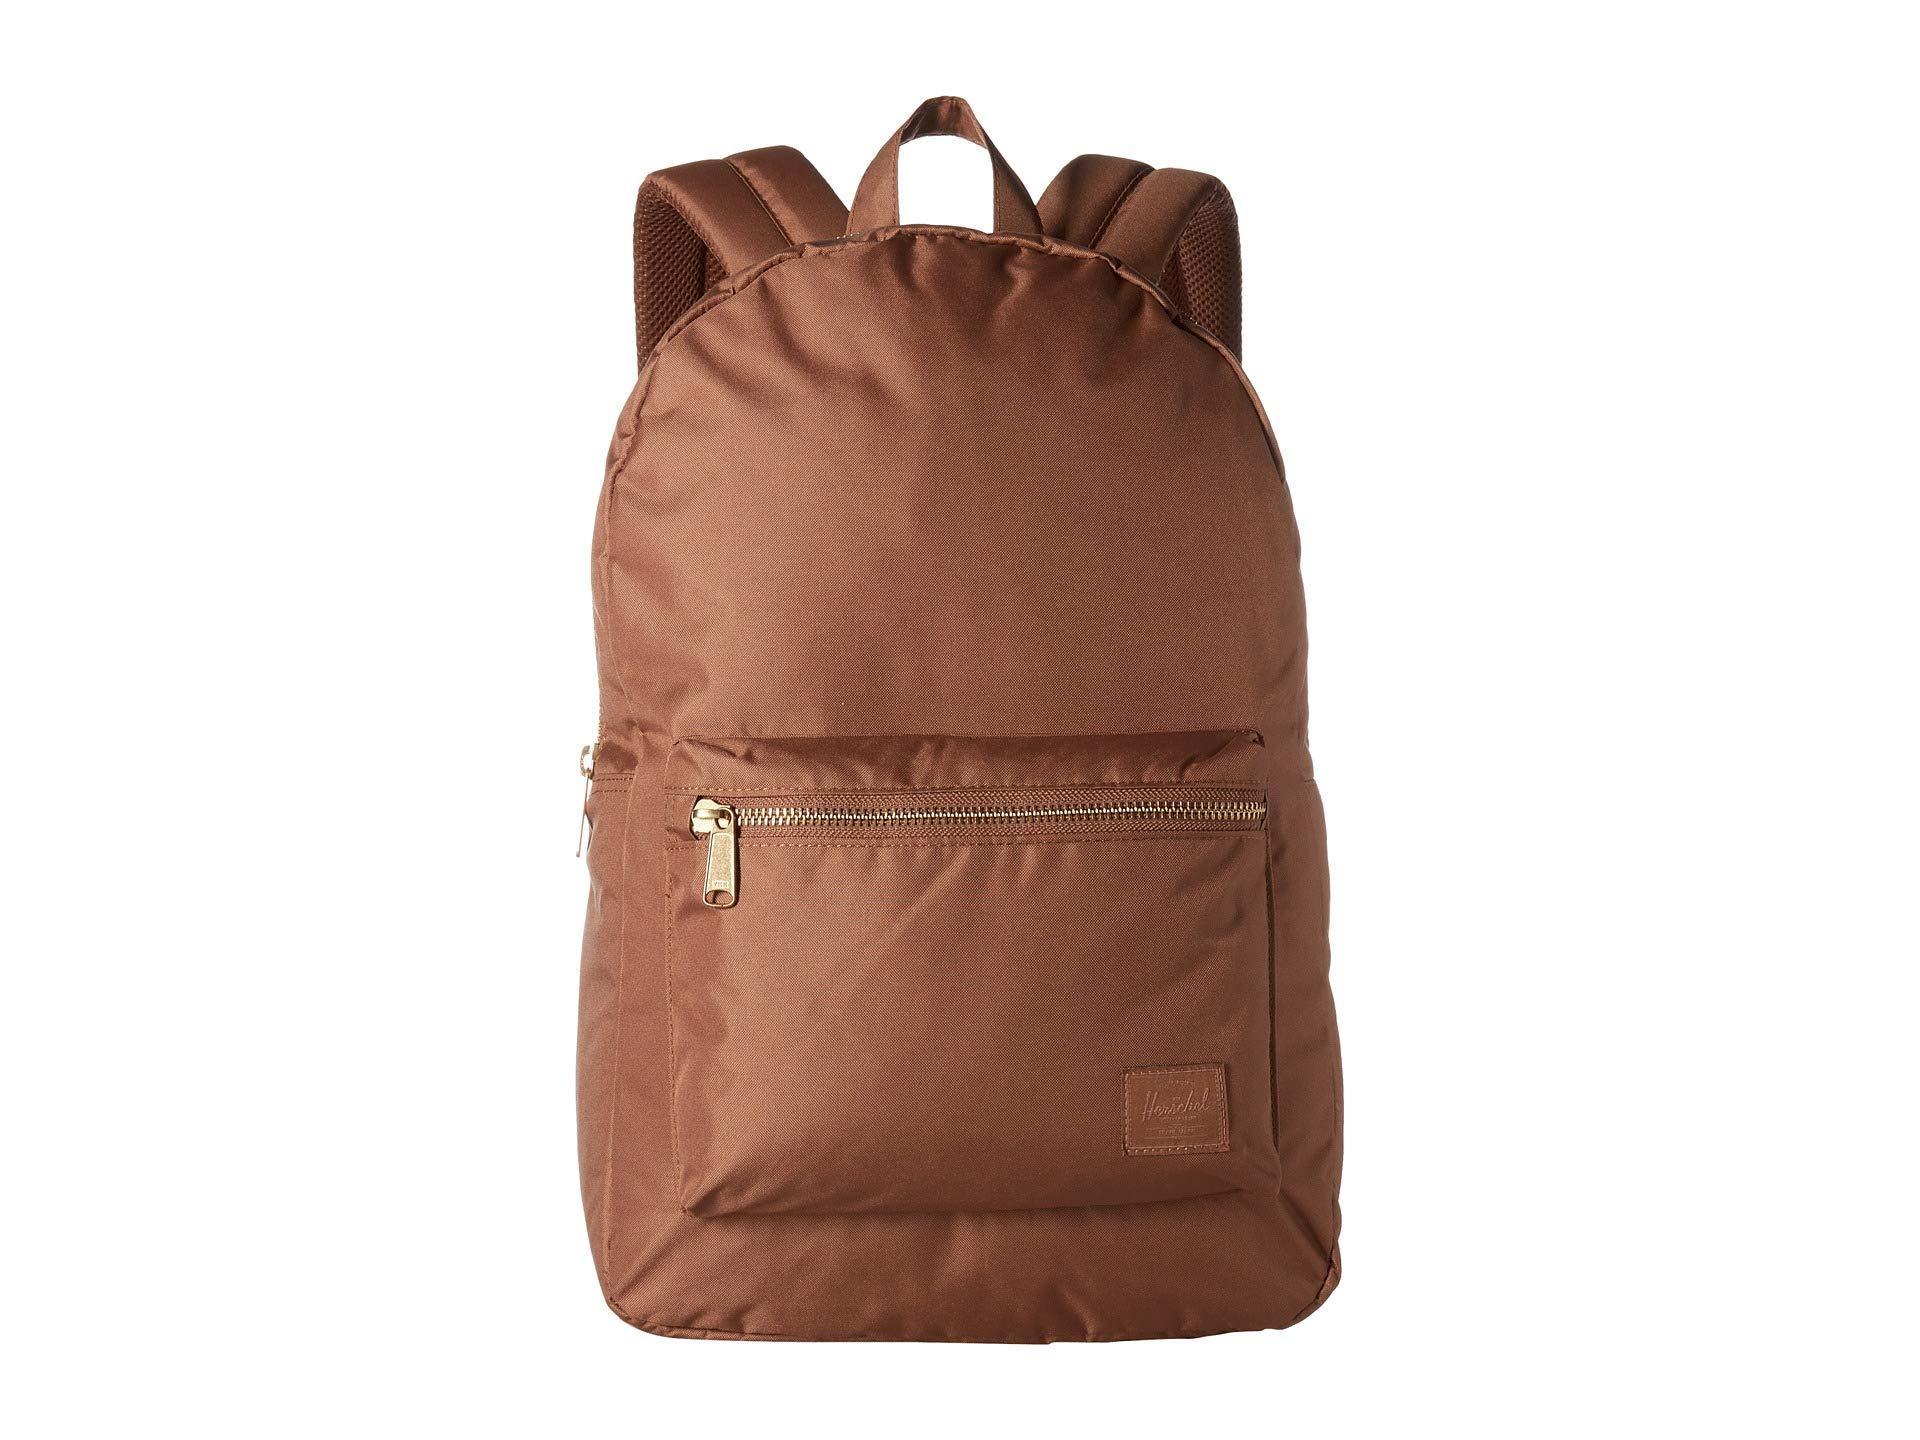 Lyst - Herschel Supply Co. Settlement Light (saddle Brown) Backpack ... 38f28b54f5076